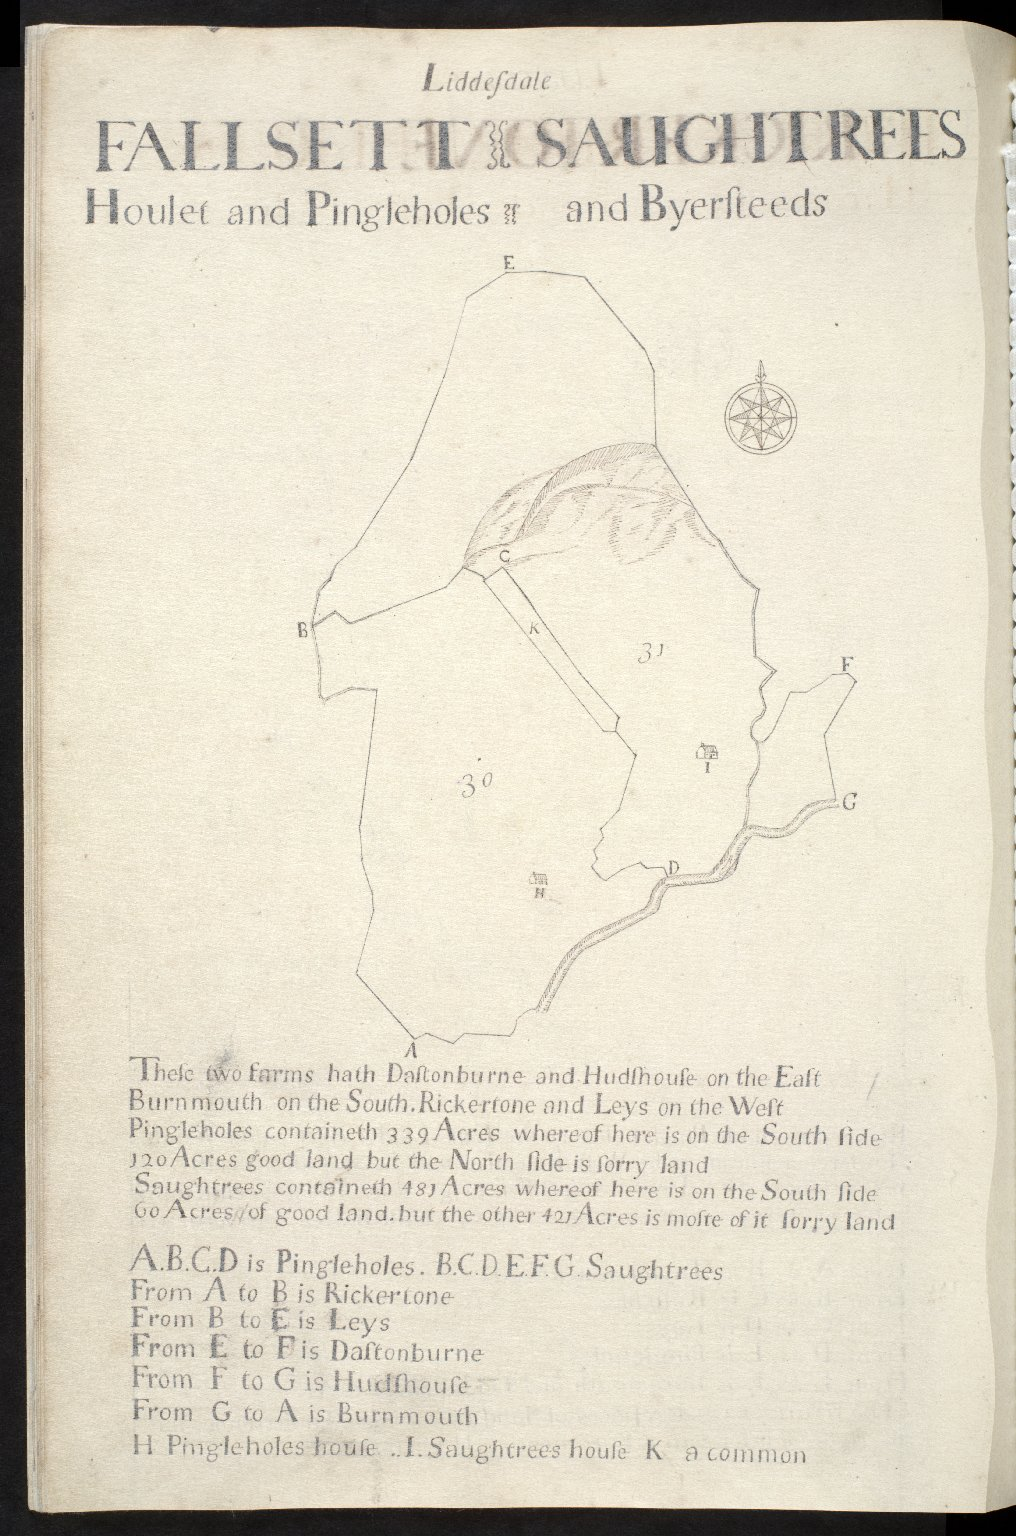 Liddesdale : Fallsett, Saughtrees, [1 of 1]